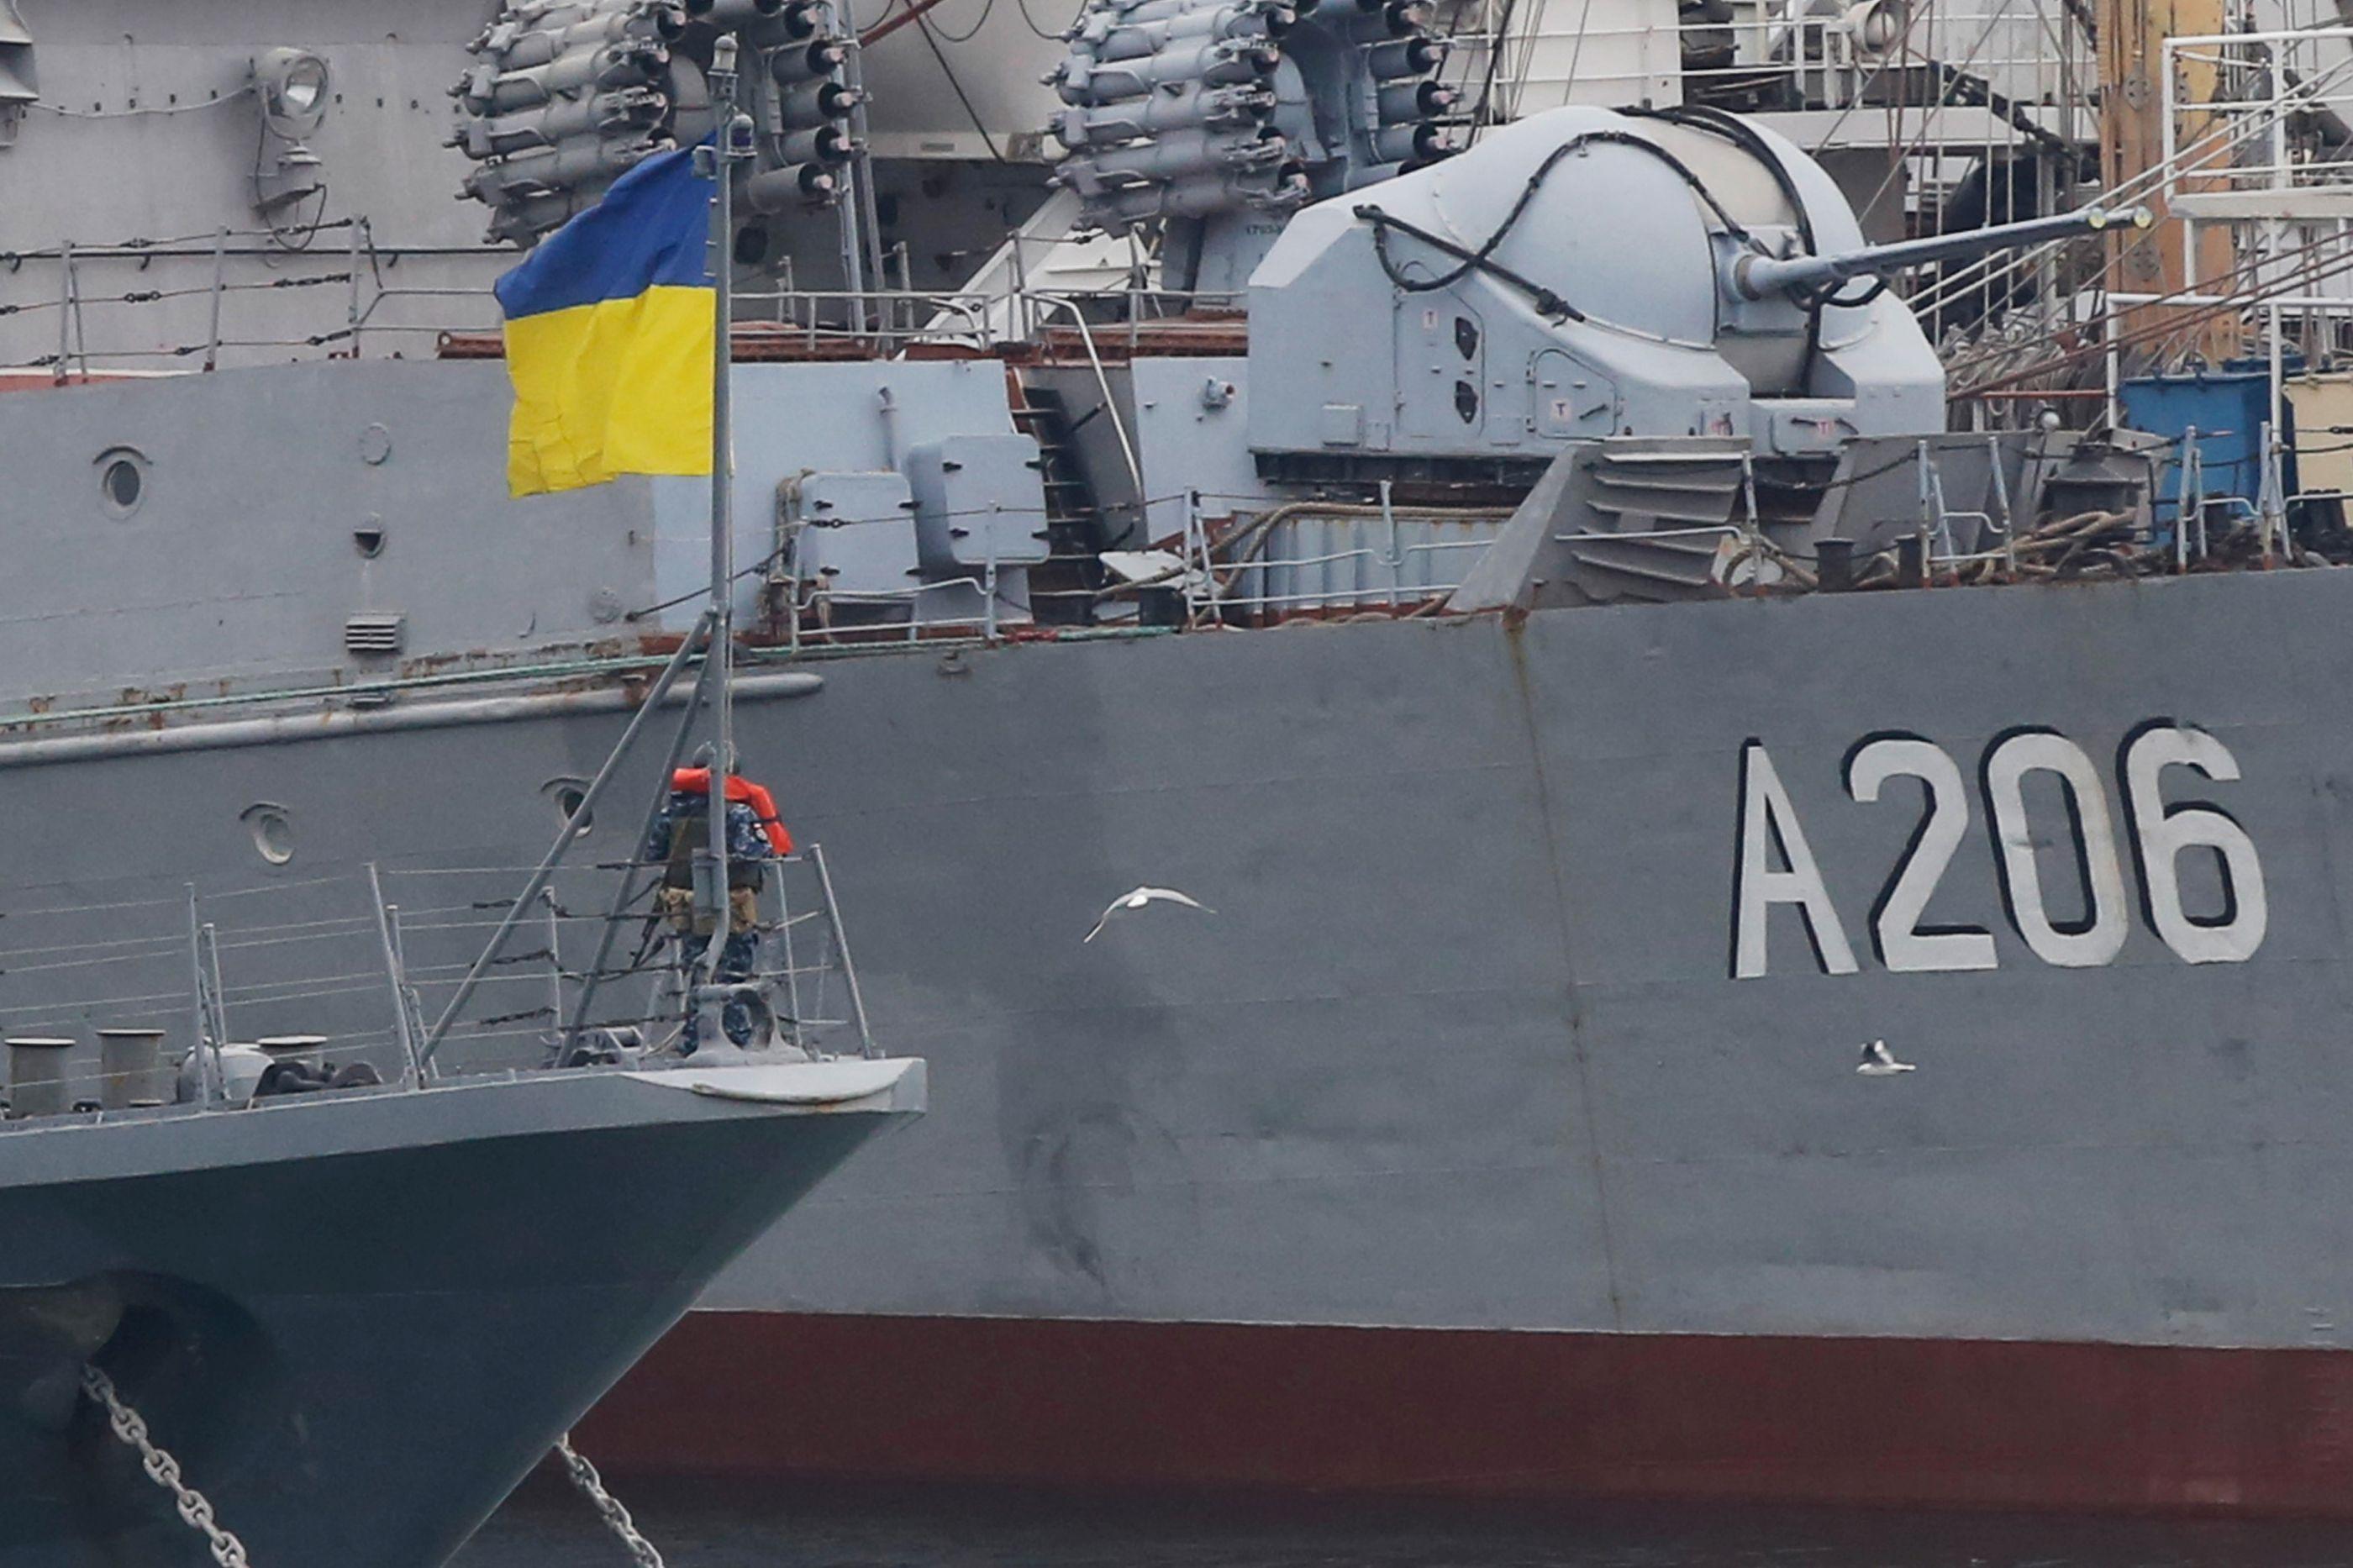 Ucrânia anuncia para breve envio de navios para o estreito de Kerch